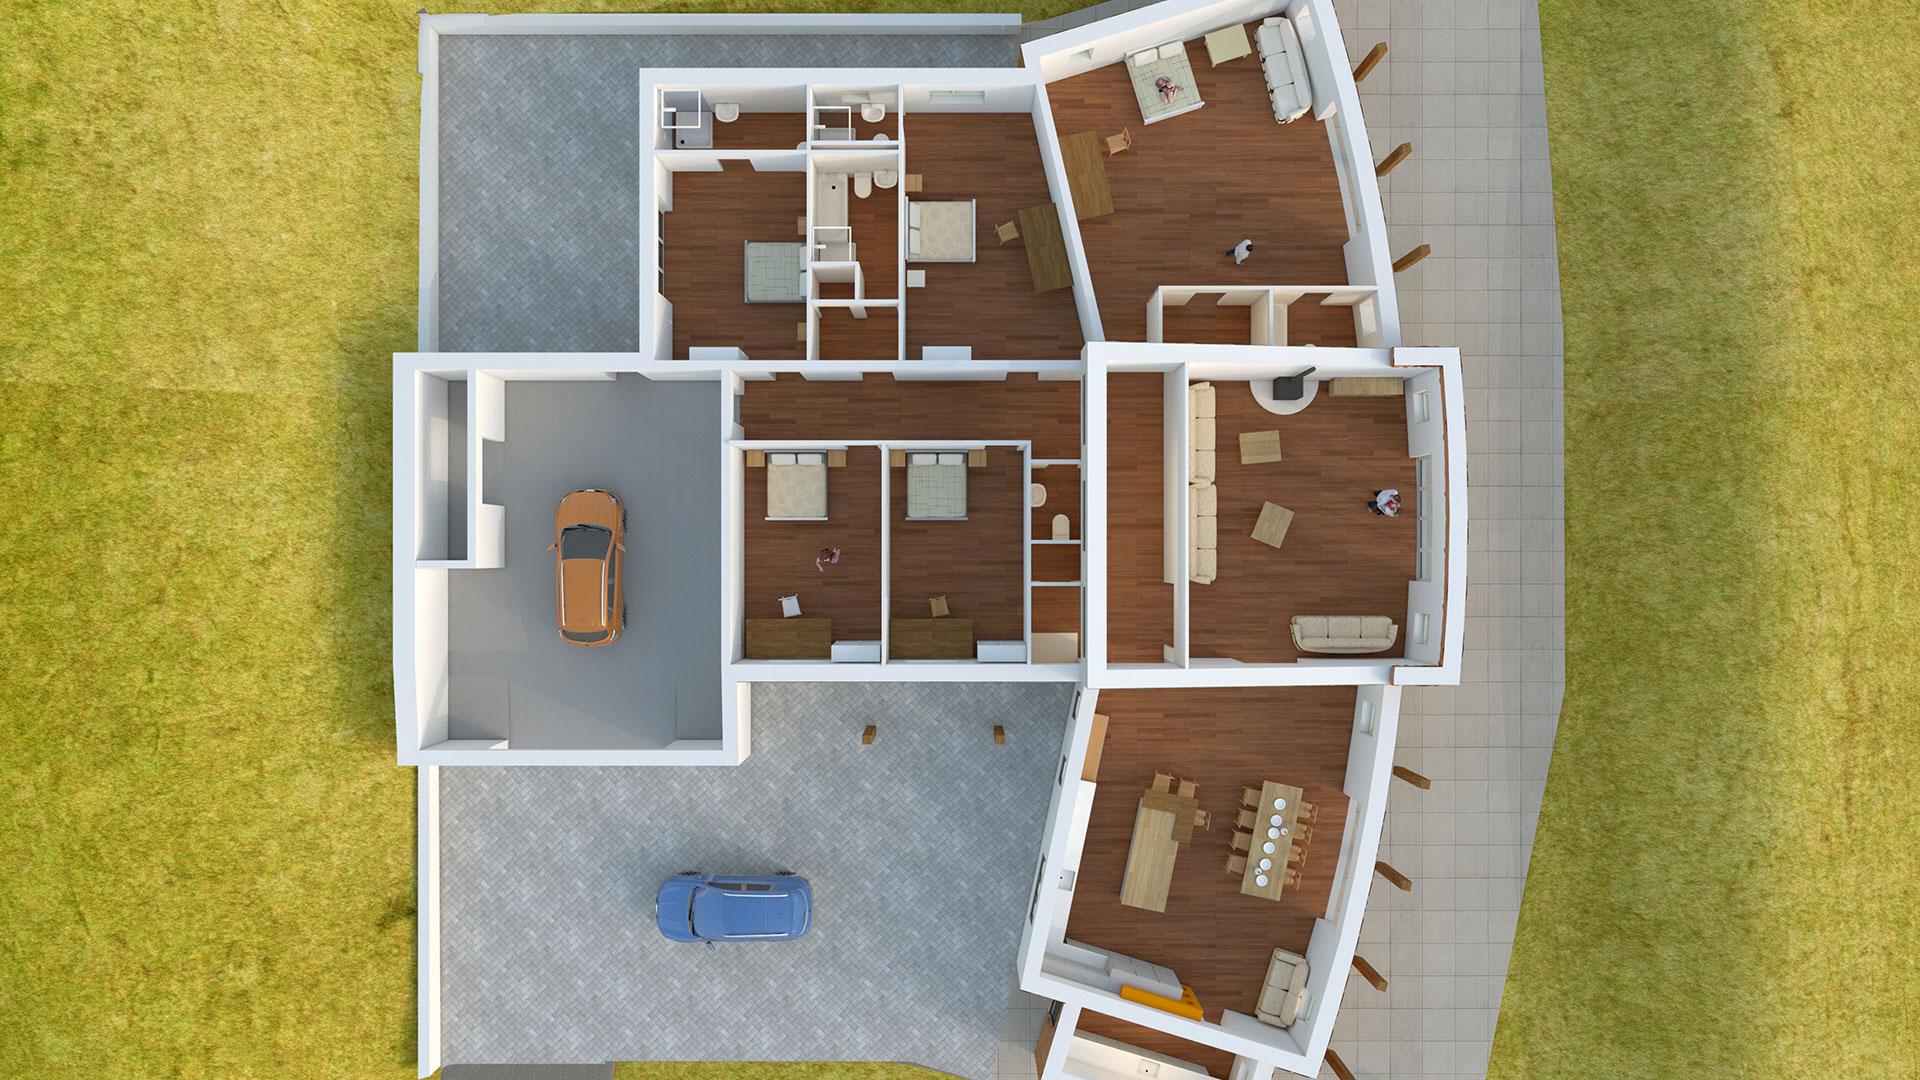 Architectural CGI visualisation image plan view